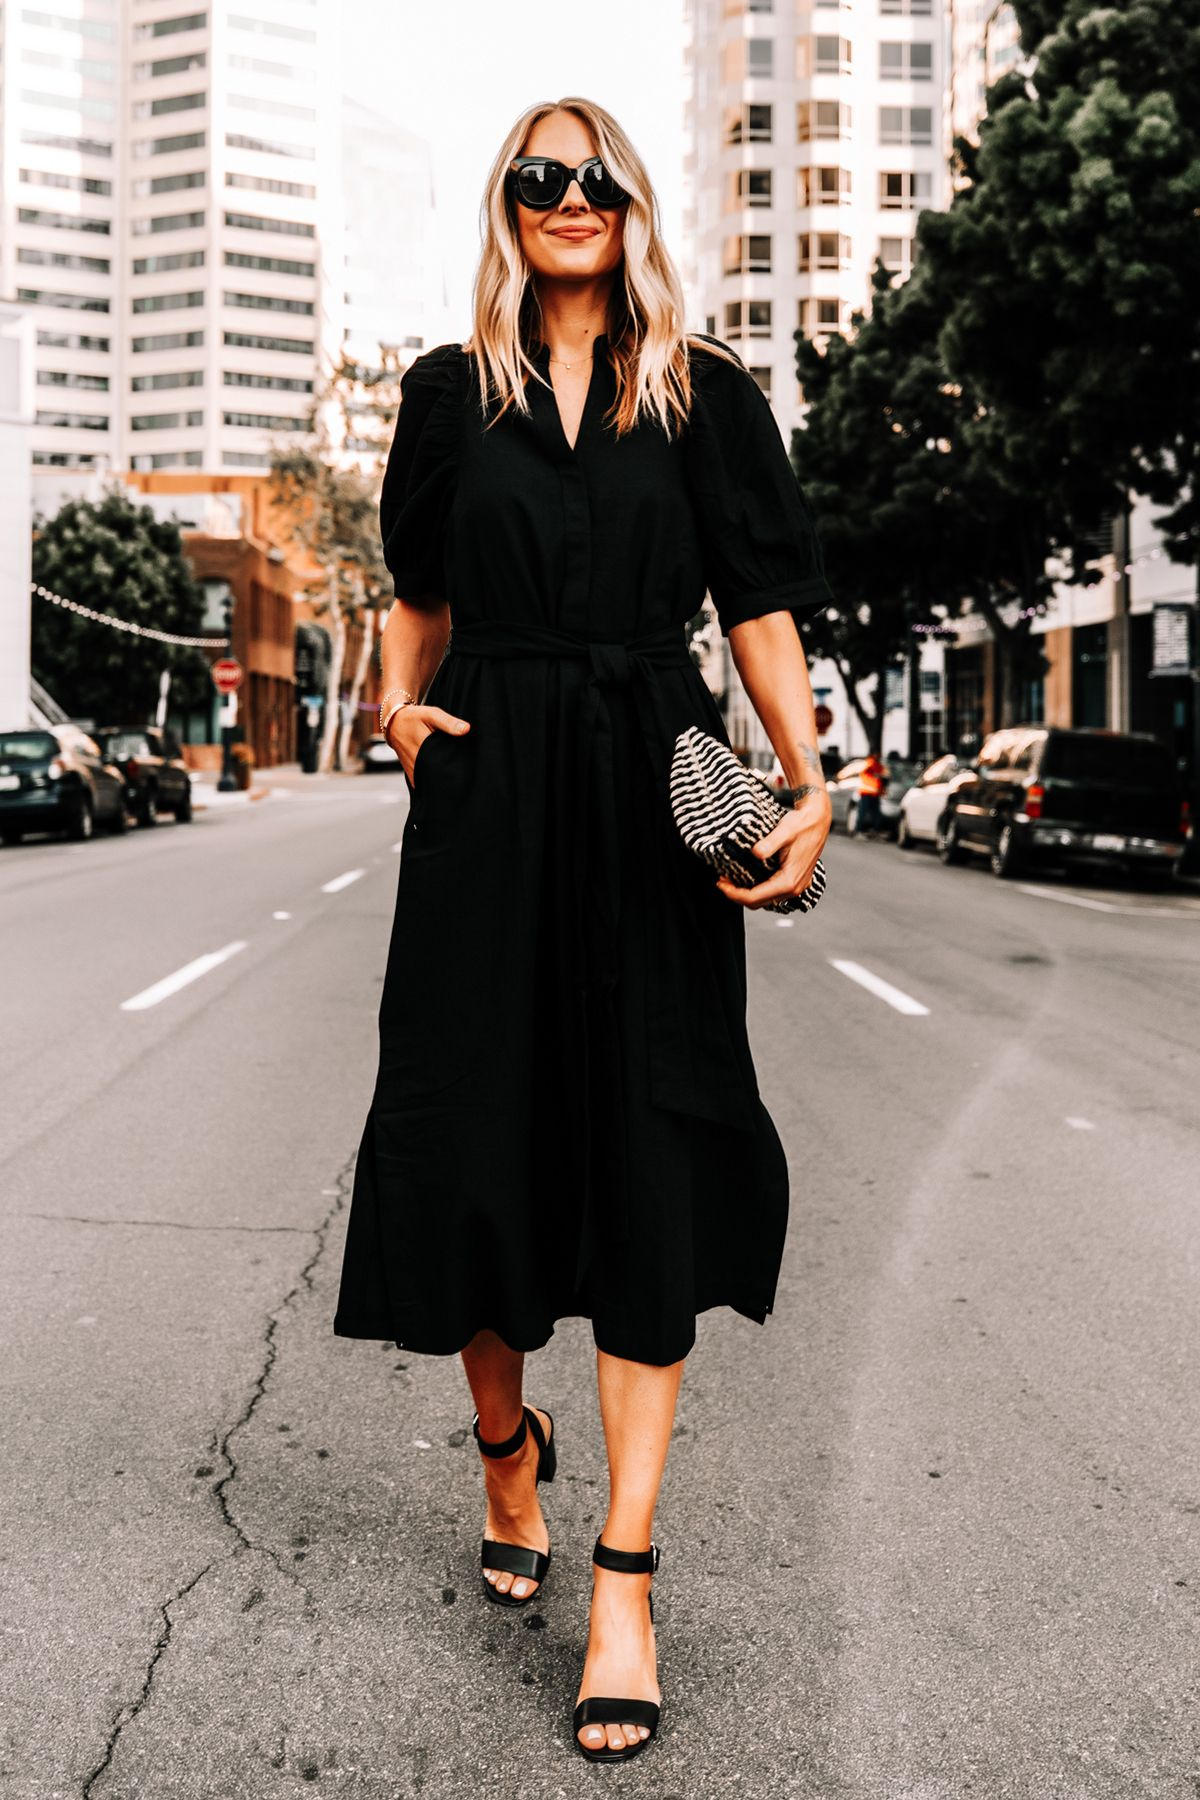 Fashion Jackson Wearing Ann Taylor Black Shirt Dress Black Heeled Sandals Black Tan Woven Clutch 1 Summer Black Dress Fashion Jackson Black Shirt Dress [ 1800 x 1200 Pixel ]